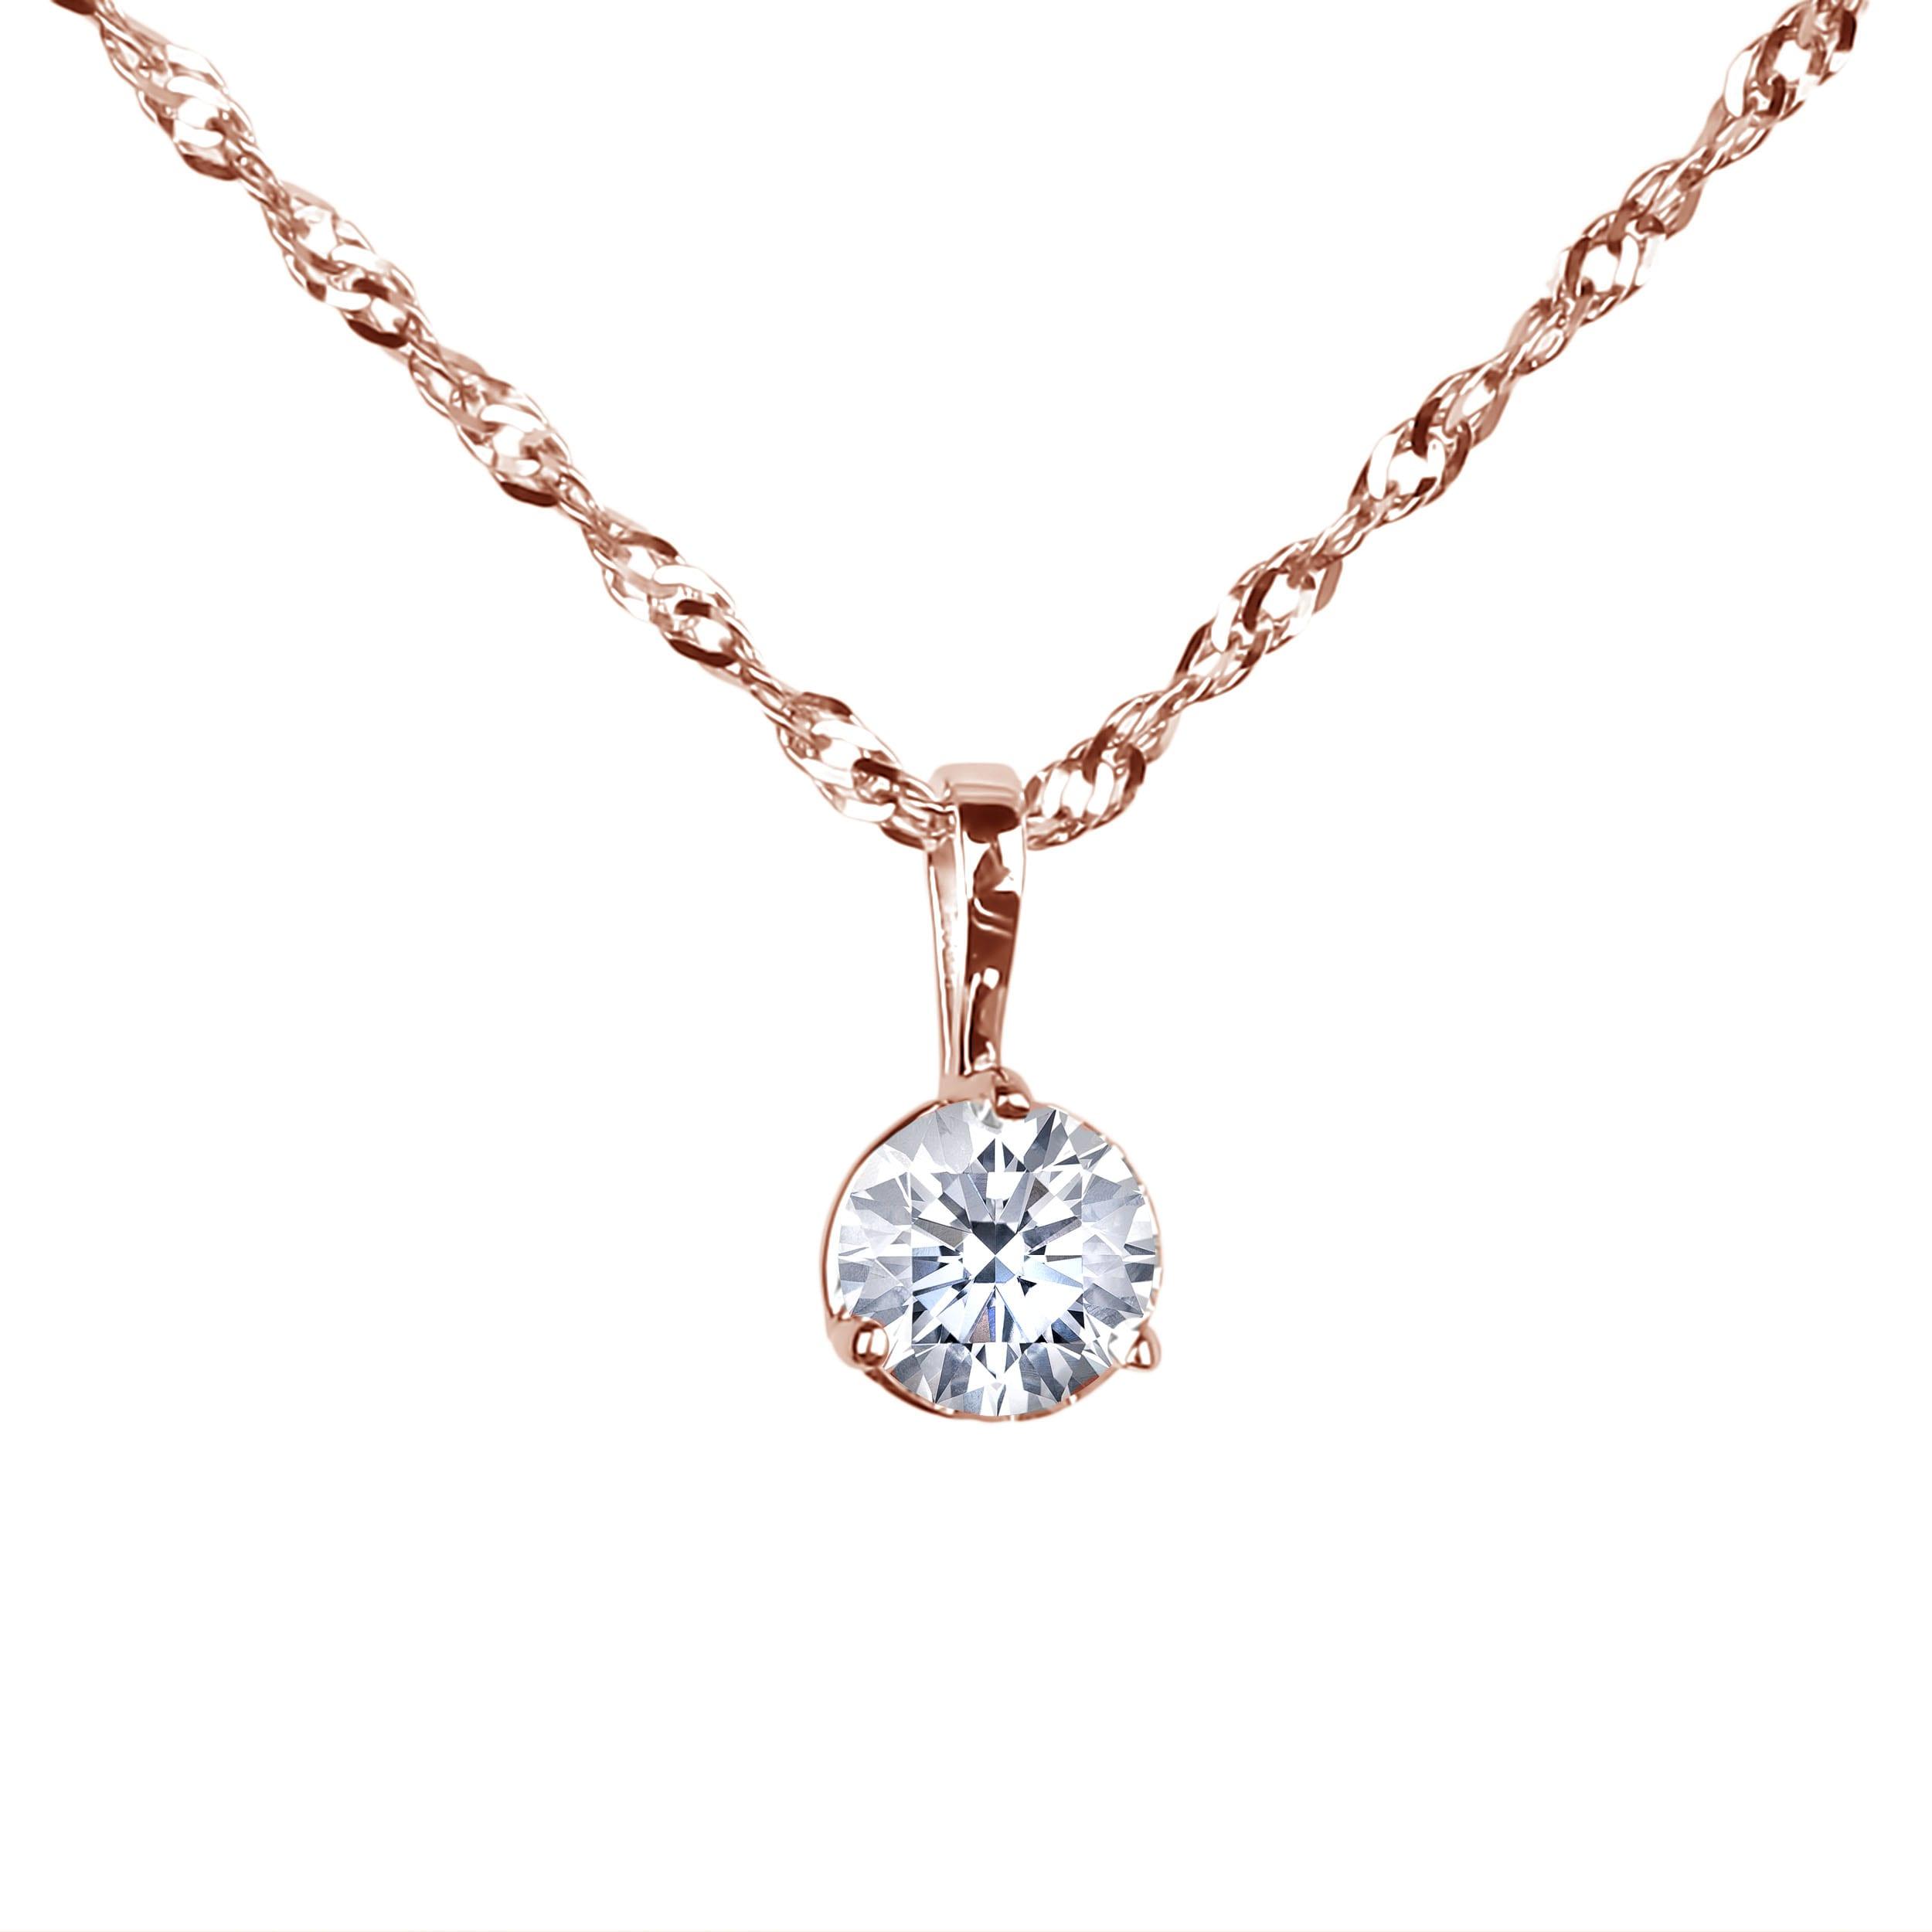 4088424b7 Canadian Diamond Solitaire Pendant & Chain In 14K Rose Gold   Lugaro